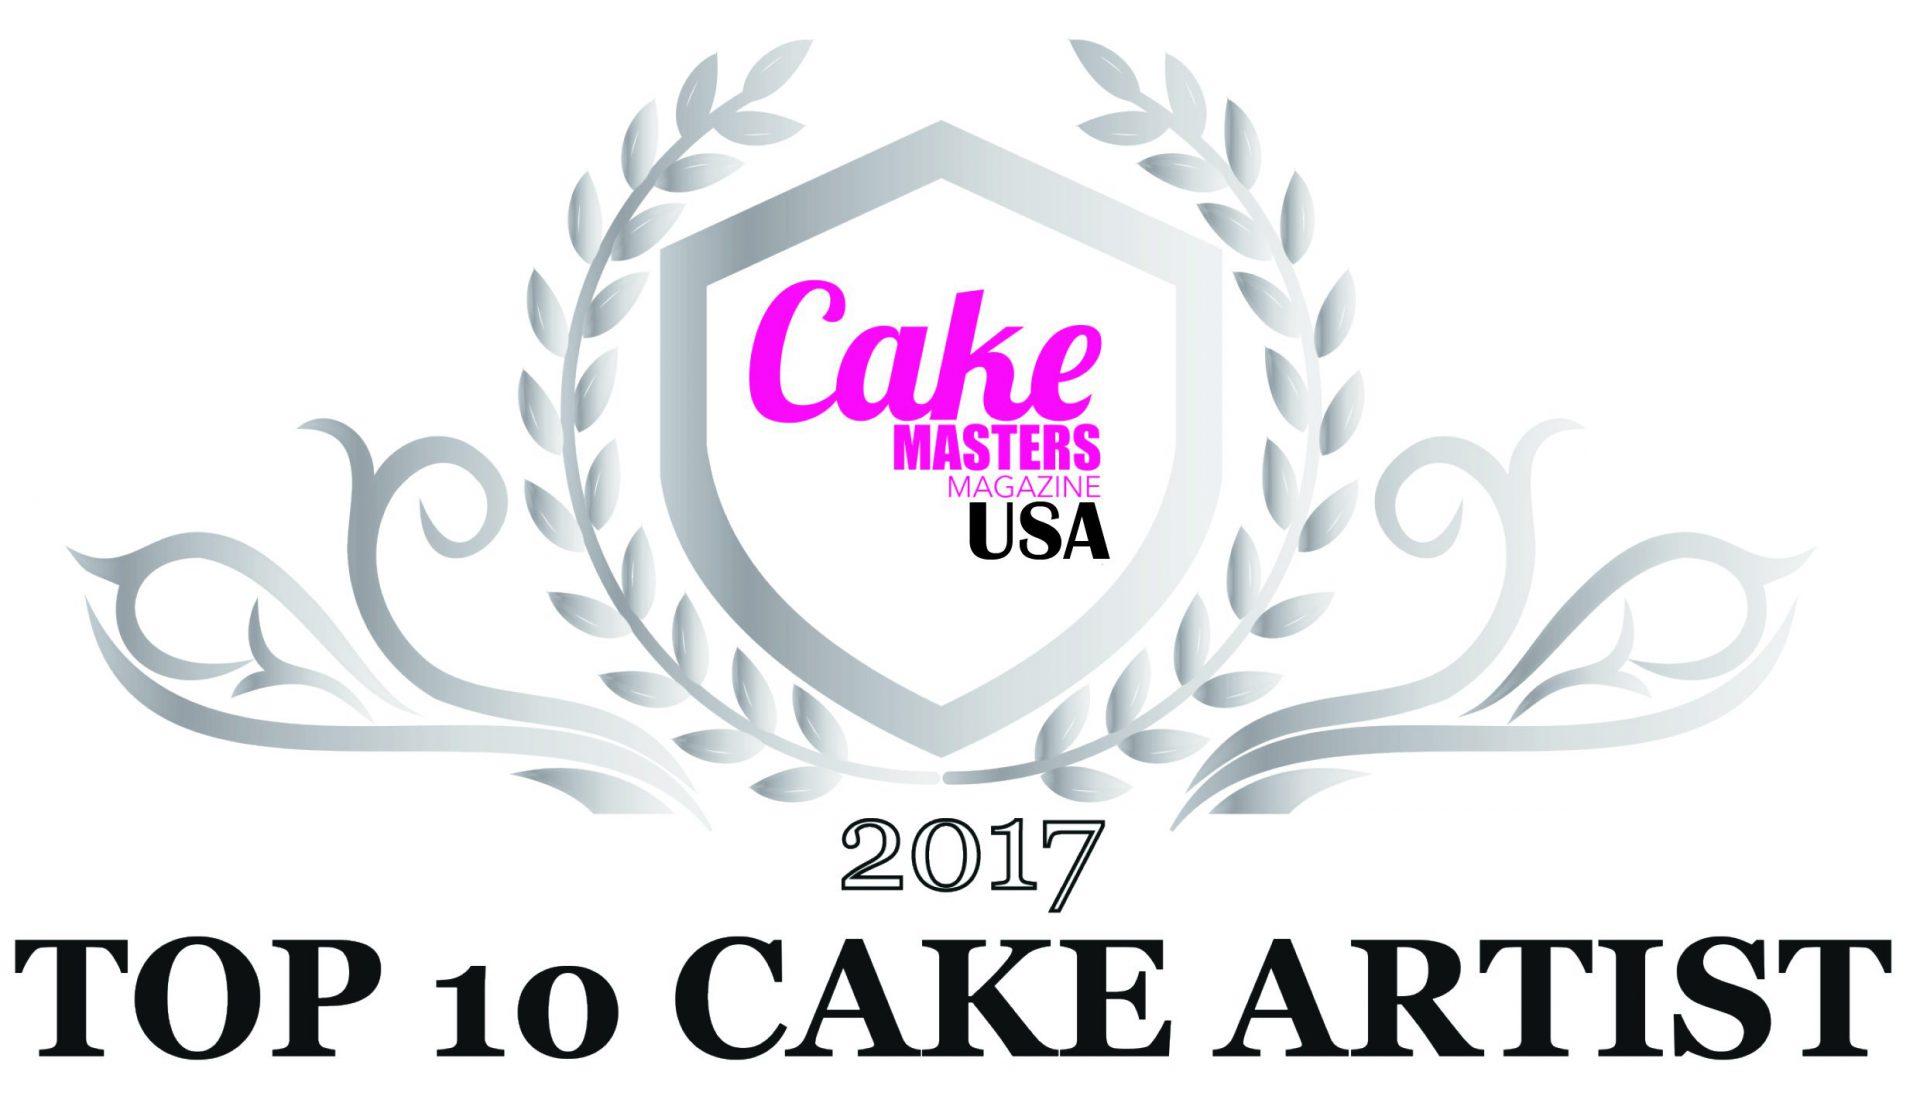 Cake Masters Magazine USA – 2017 Top 10 Cake Artist